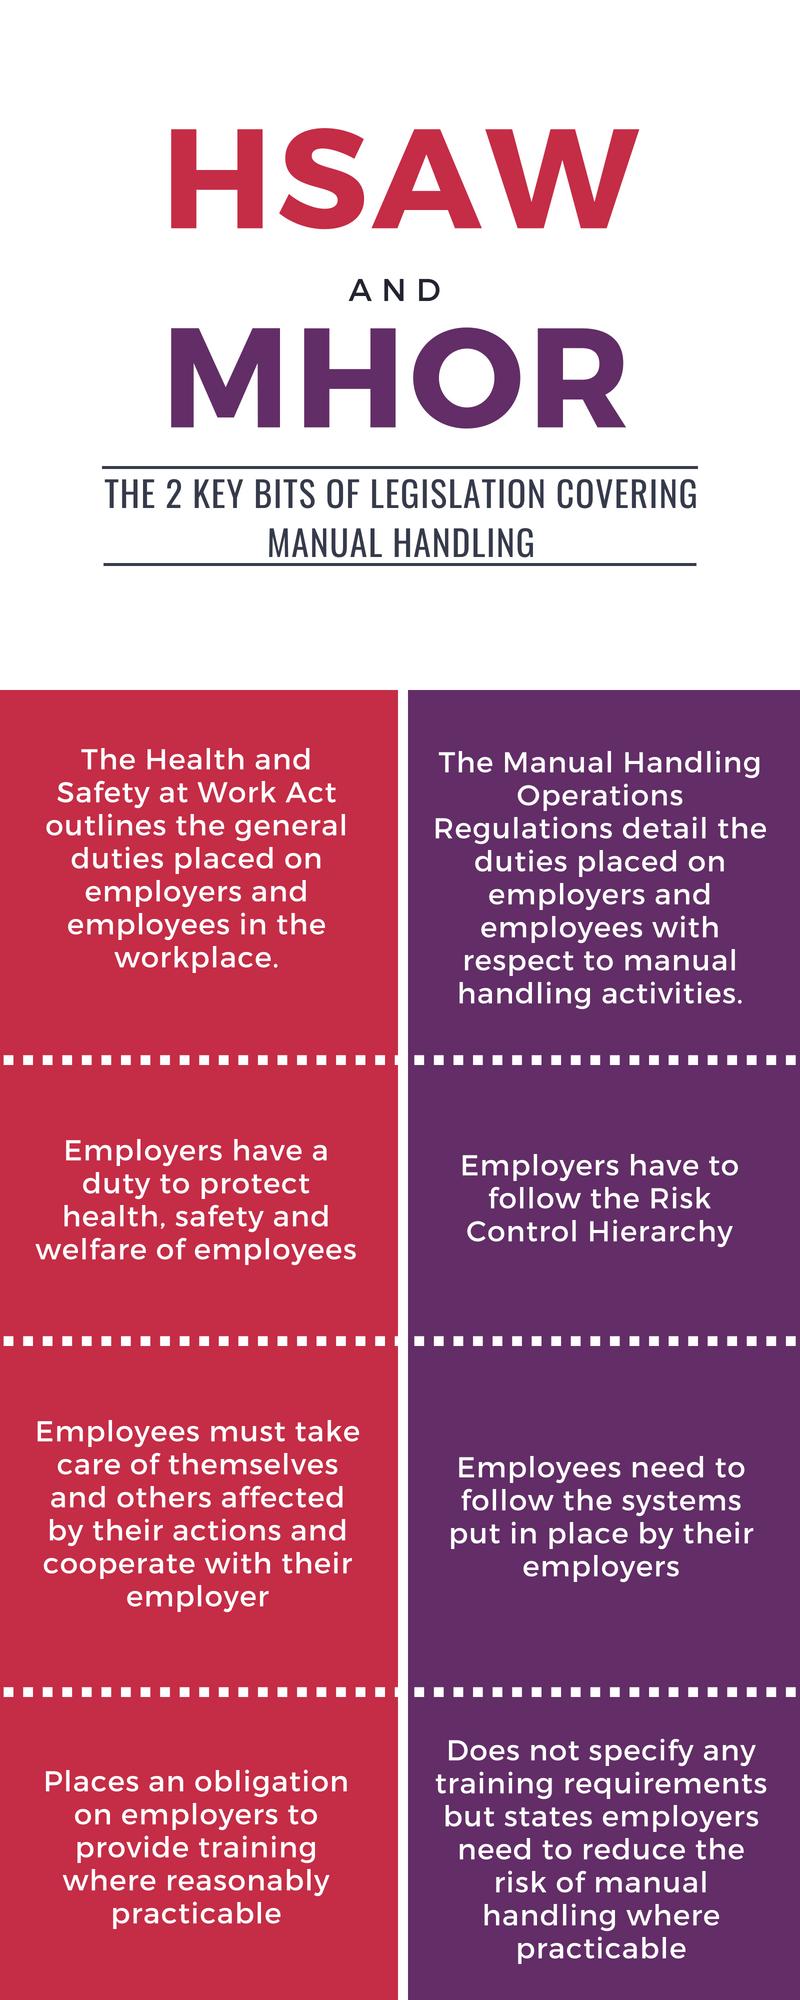 Manual handling legislation